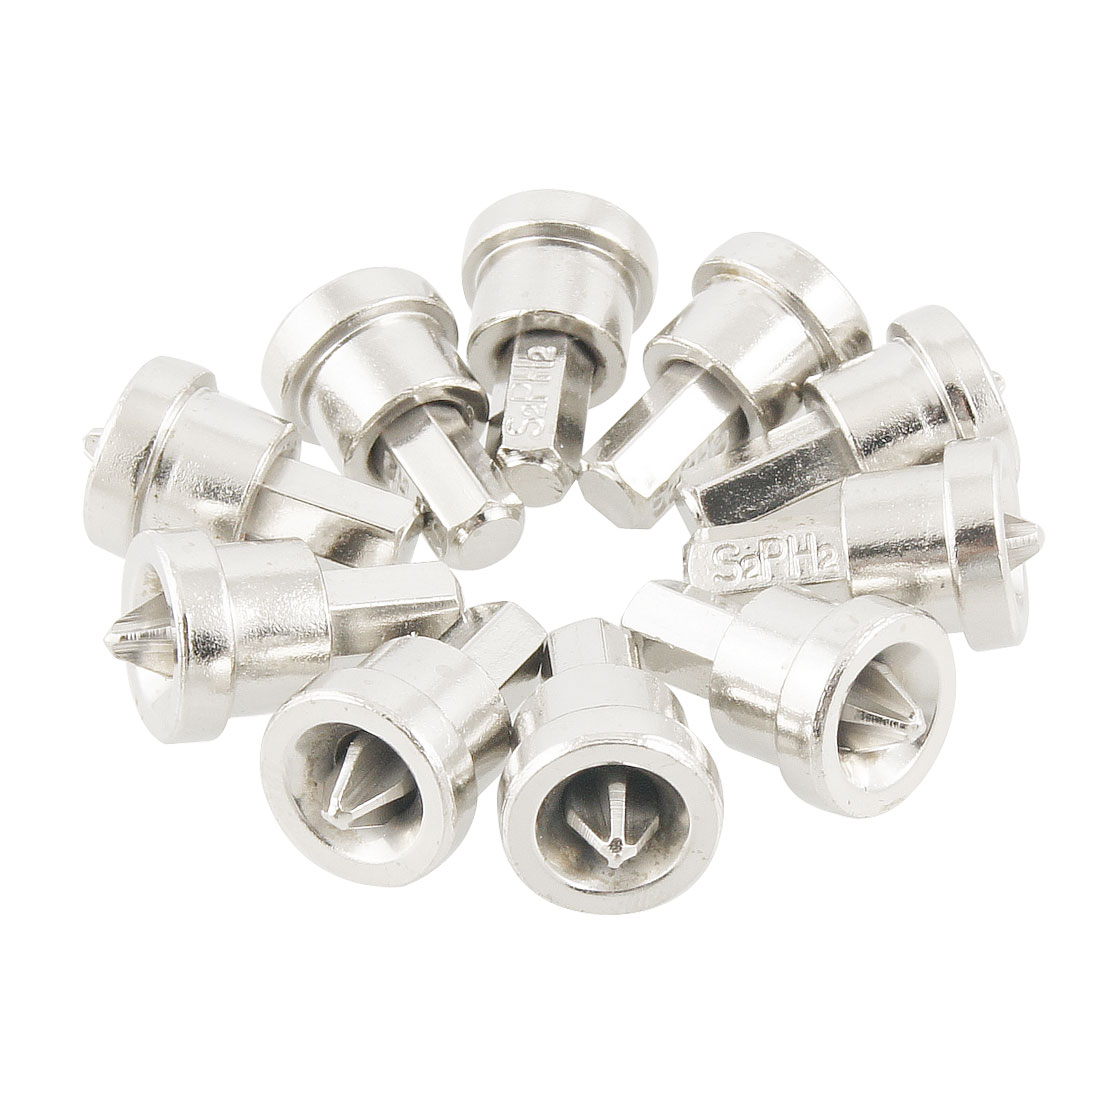 10 Pcs Silver Tone Hex Shank 6mm  Screw Setter Dimpler